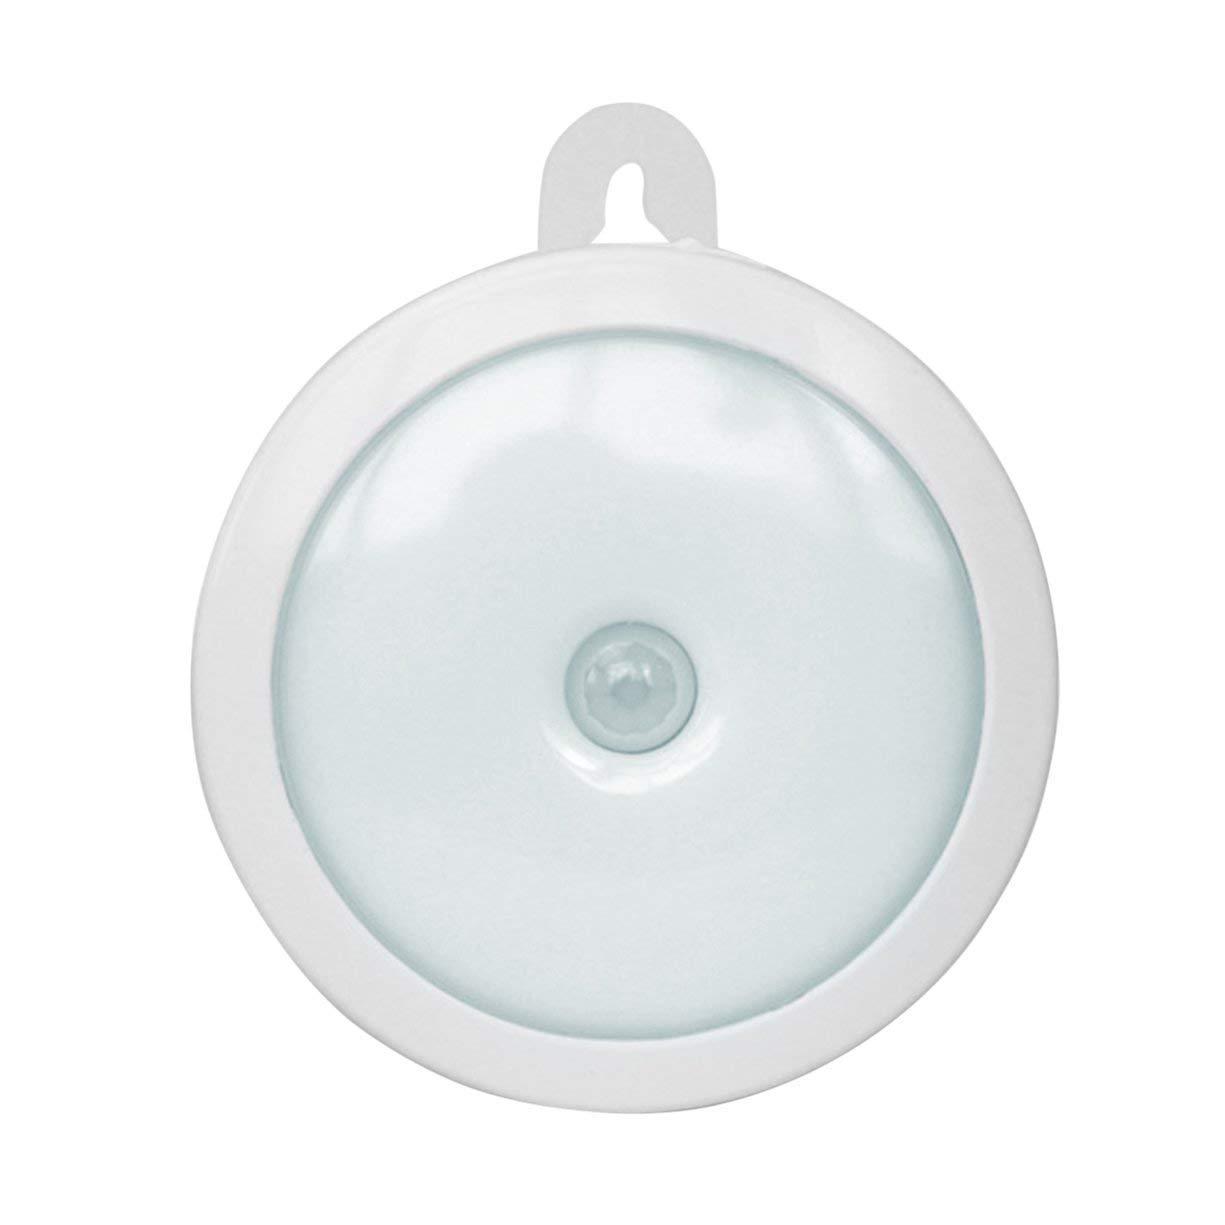 Portable LED Lamp PIR Motion Sensor Light,Portable Wireless LED Lamp PIR Motion Sensor Light Wall Light Night Light Highlight Bright Lamp for Corridor Closet